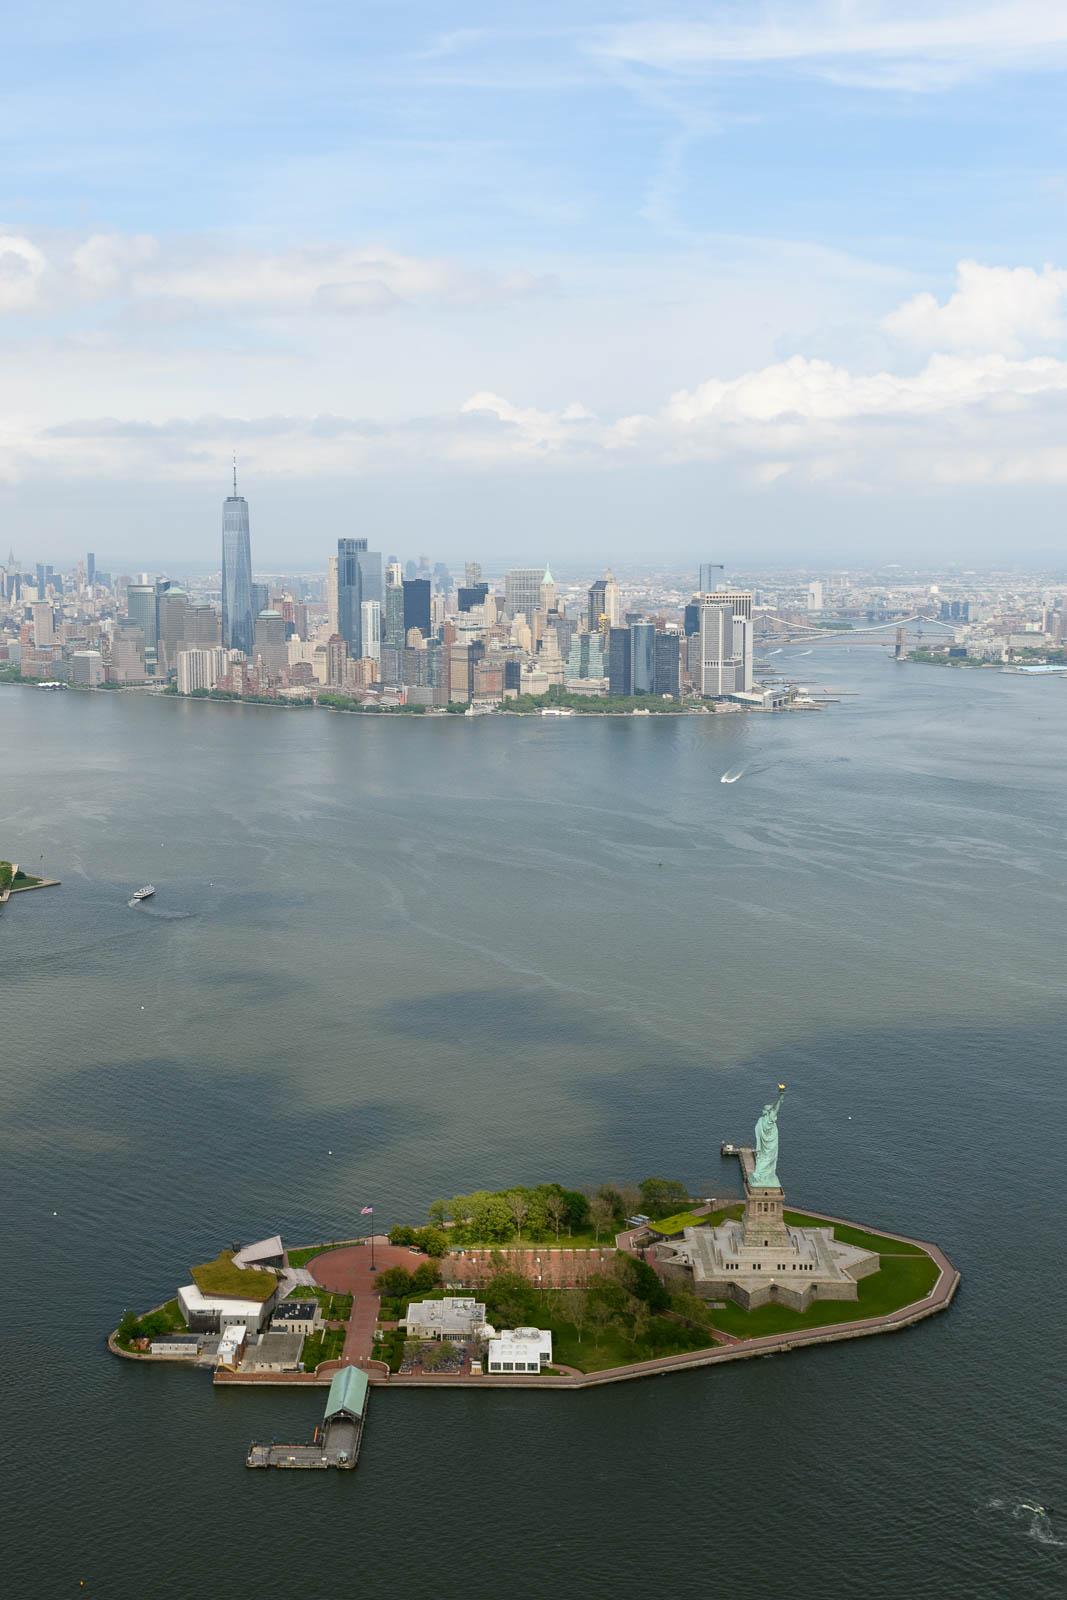 Lady Liberty welcomes...